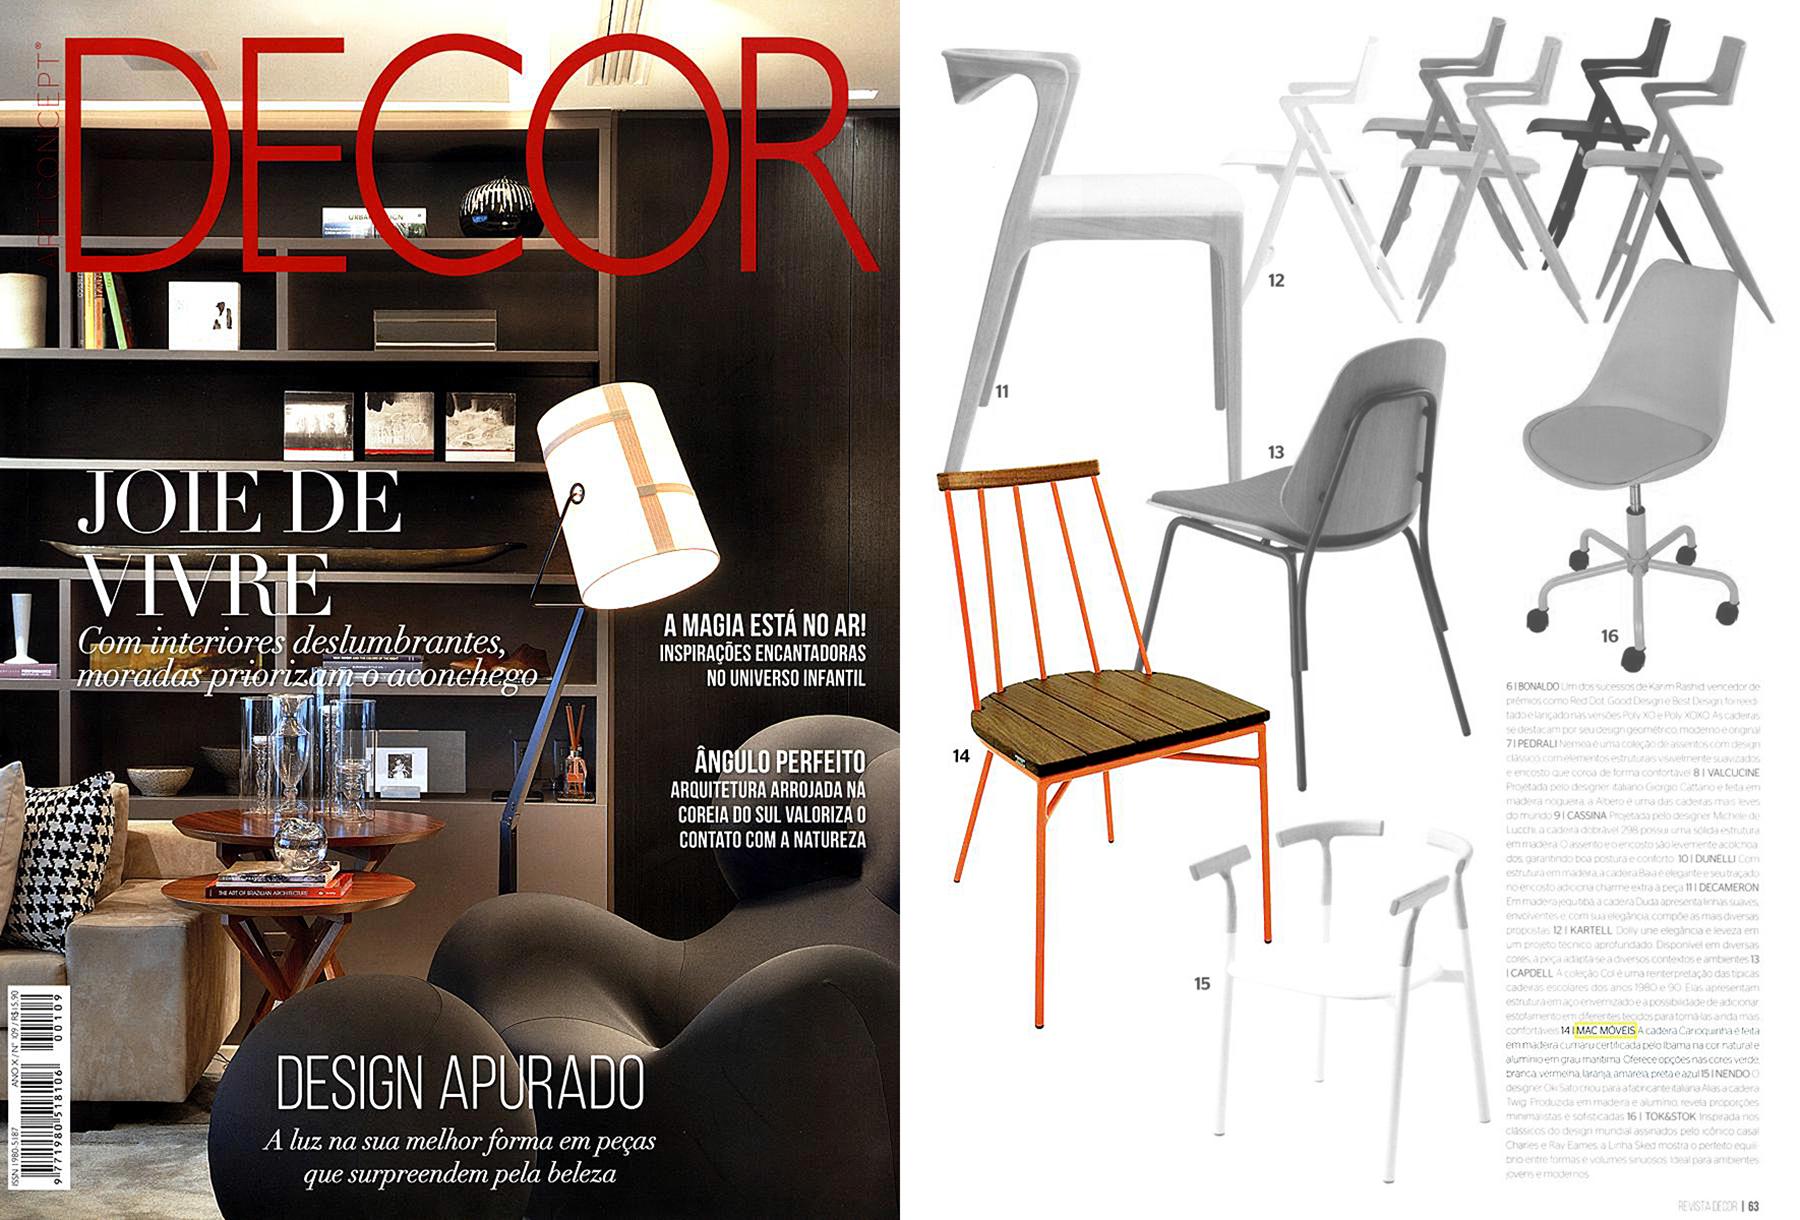 DECOR nº 109 - October 2015